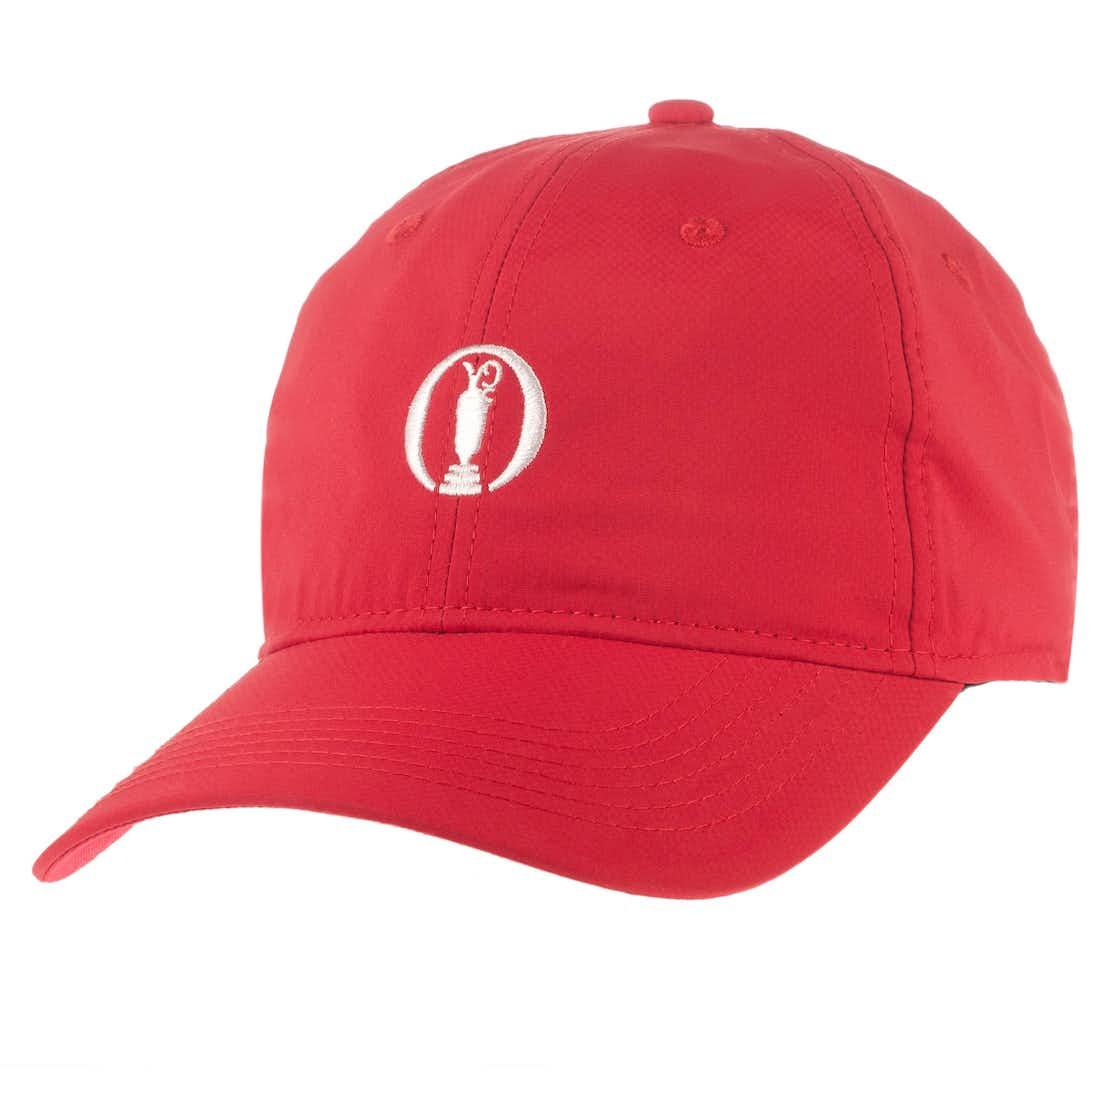 The Open Baseball Cap - Red